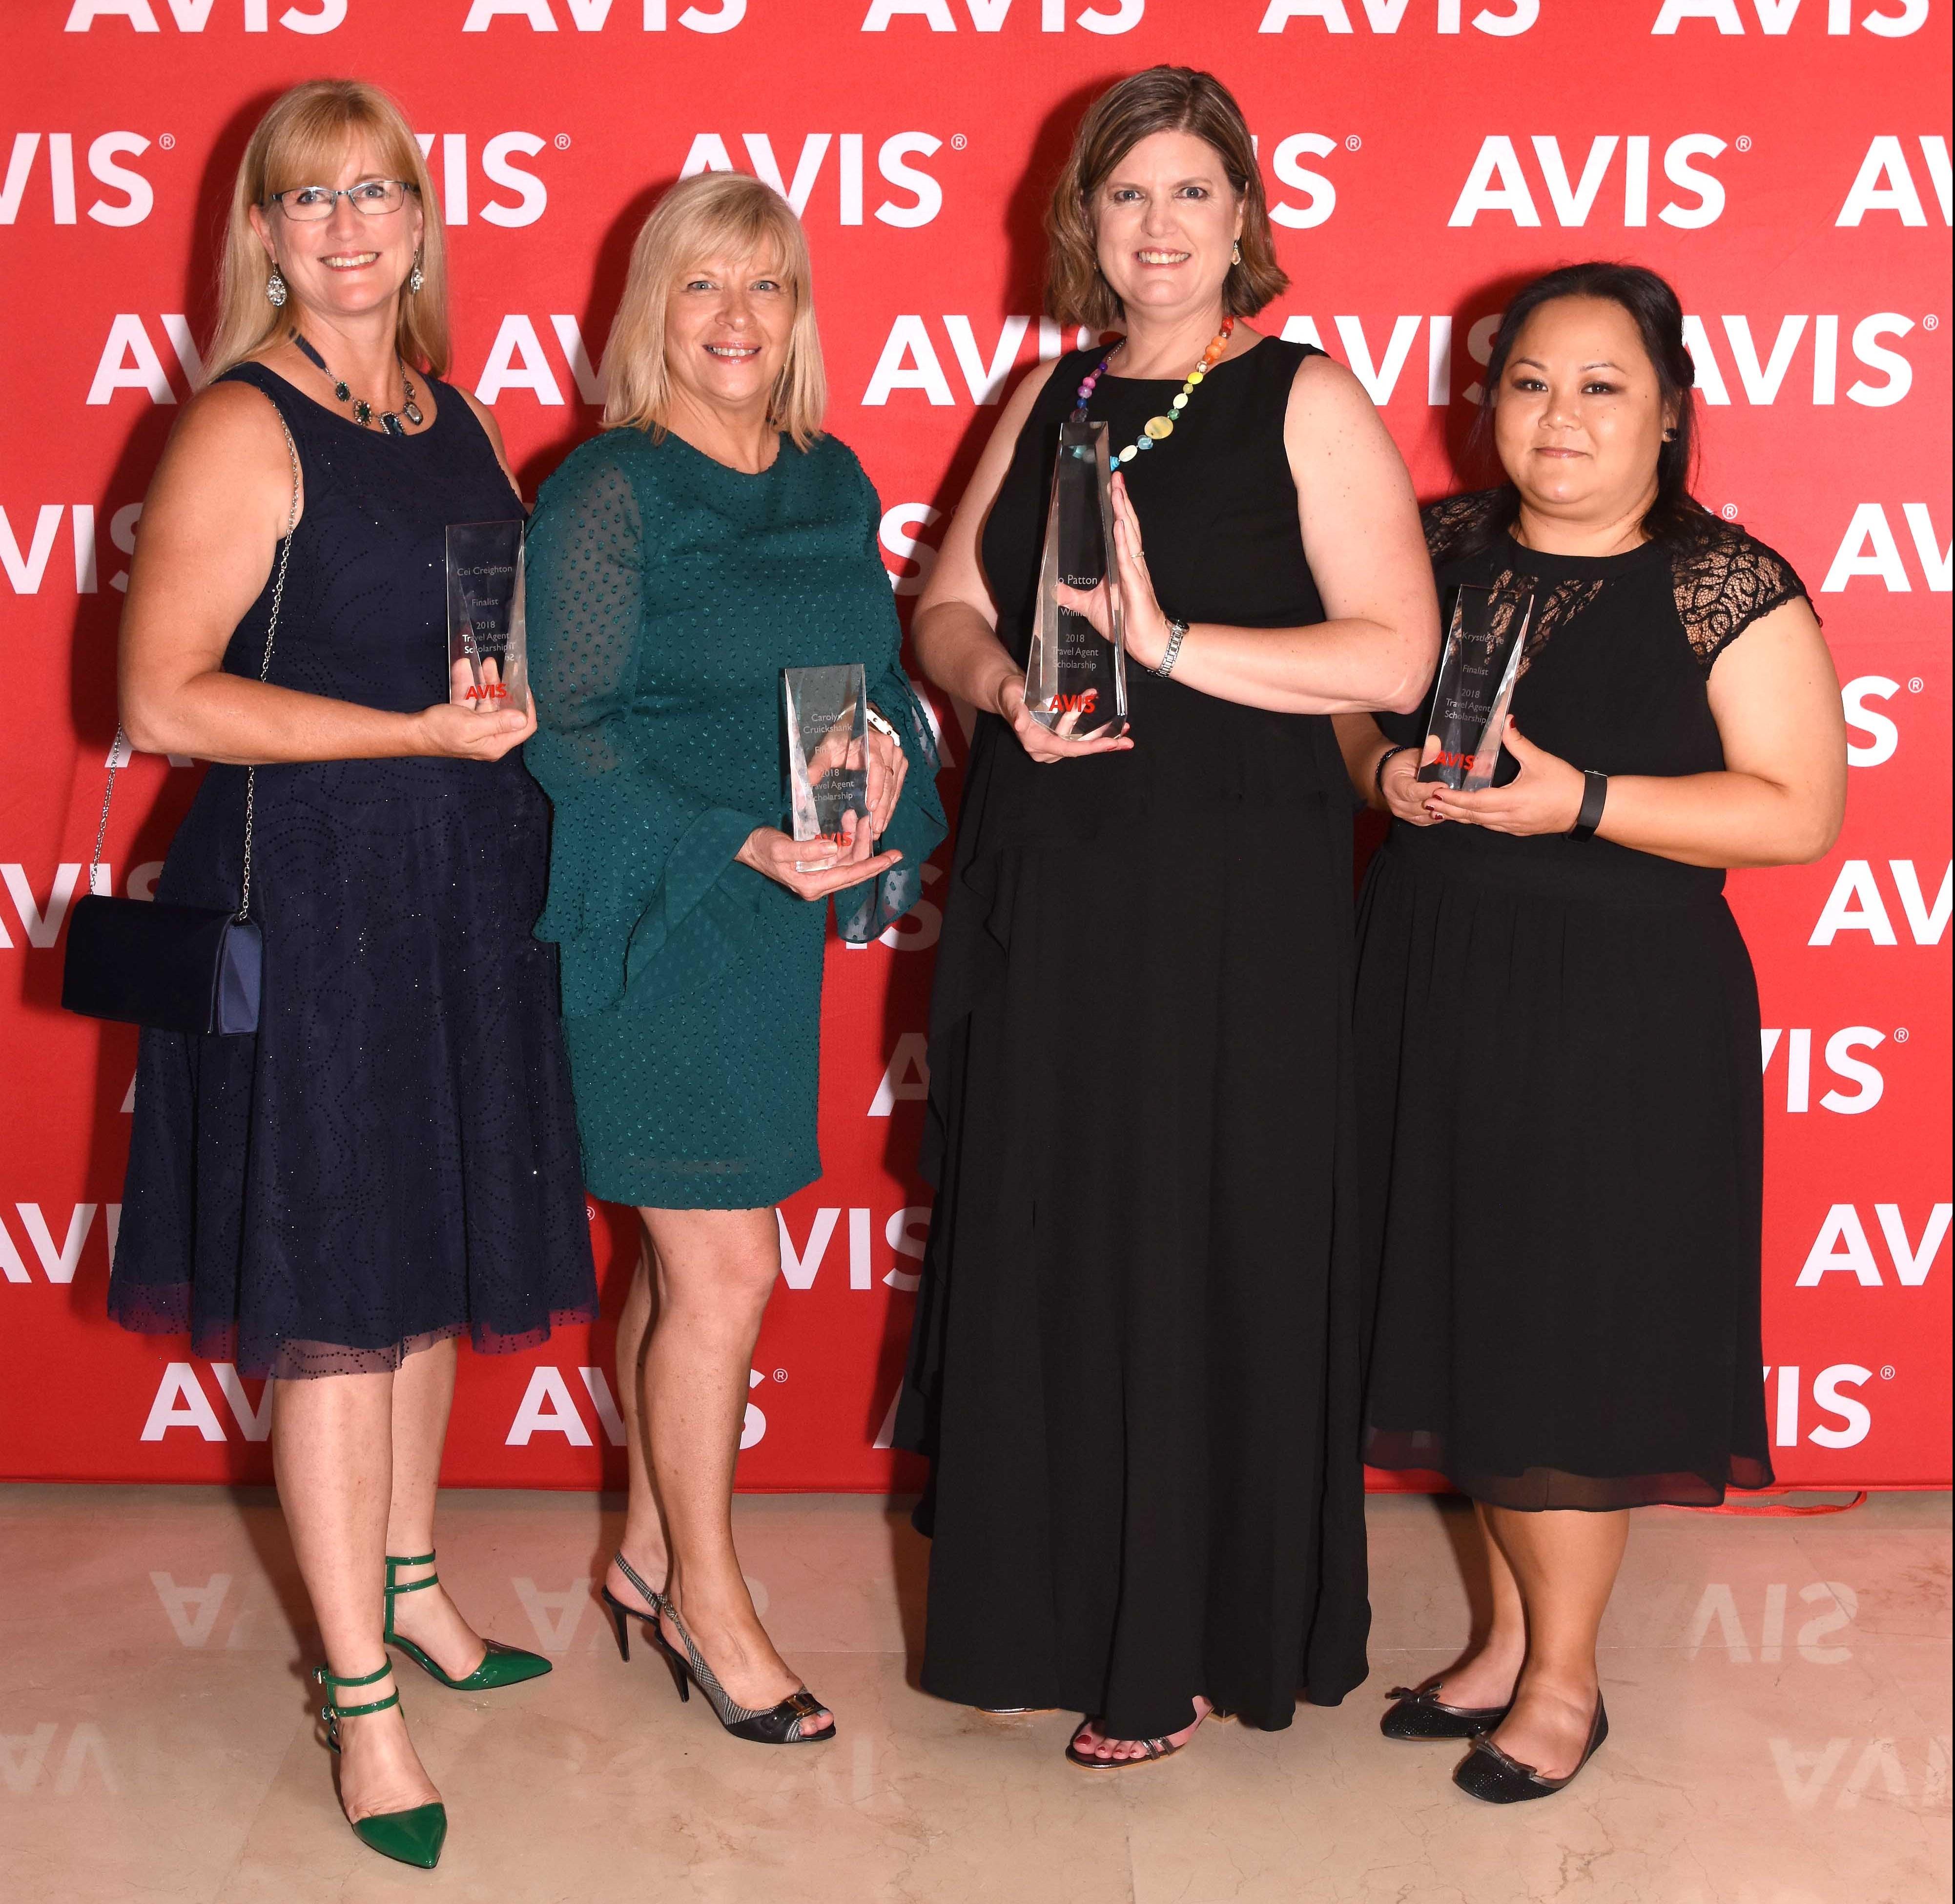 Finalists: Cei Creighton of MTA, Carolyn Cruickshank of Flight Centre, Krystle Tse of Traveledge and Winner Jo Patton of Travel Managers